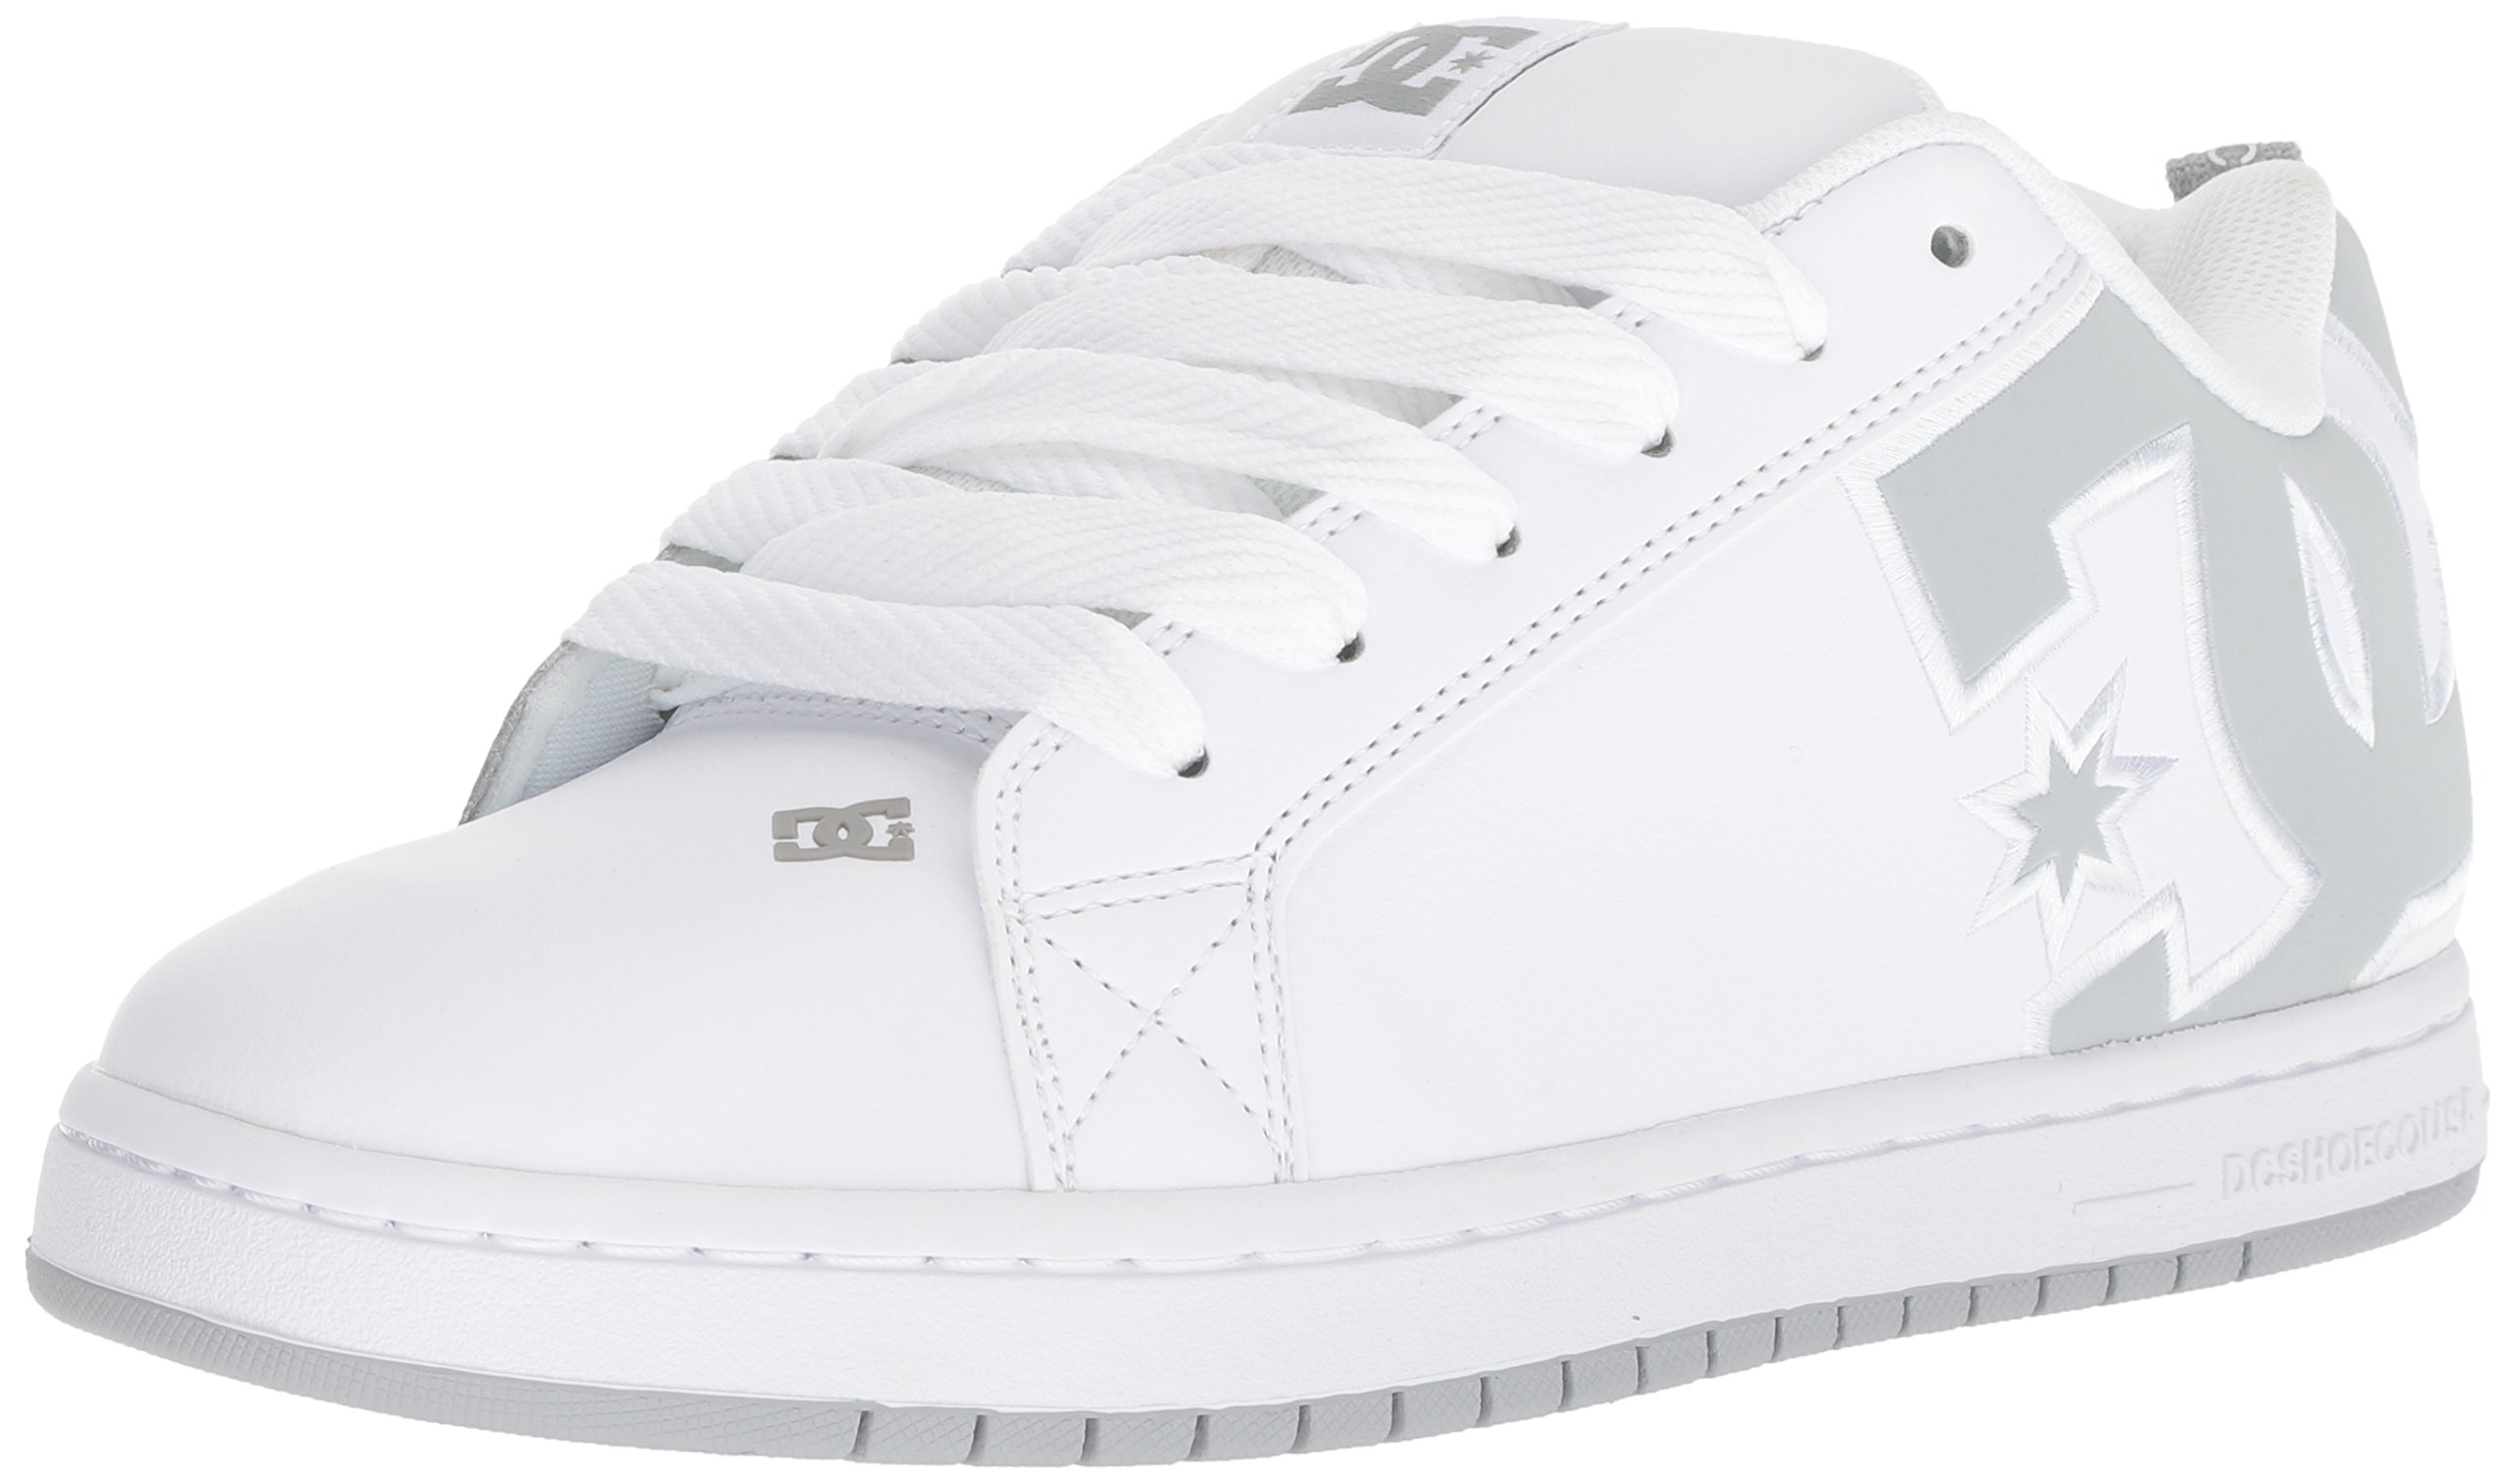 DC Men's Court Graffik SE Skate Shoe White Grey, 15 Medium US by DC (Image #1)